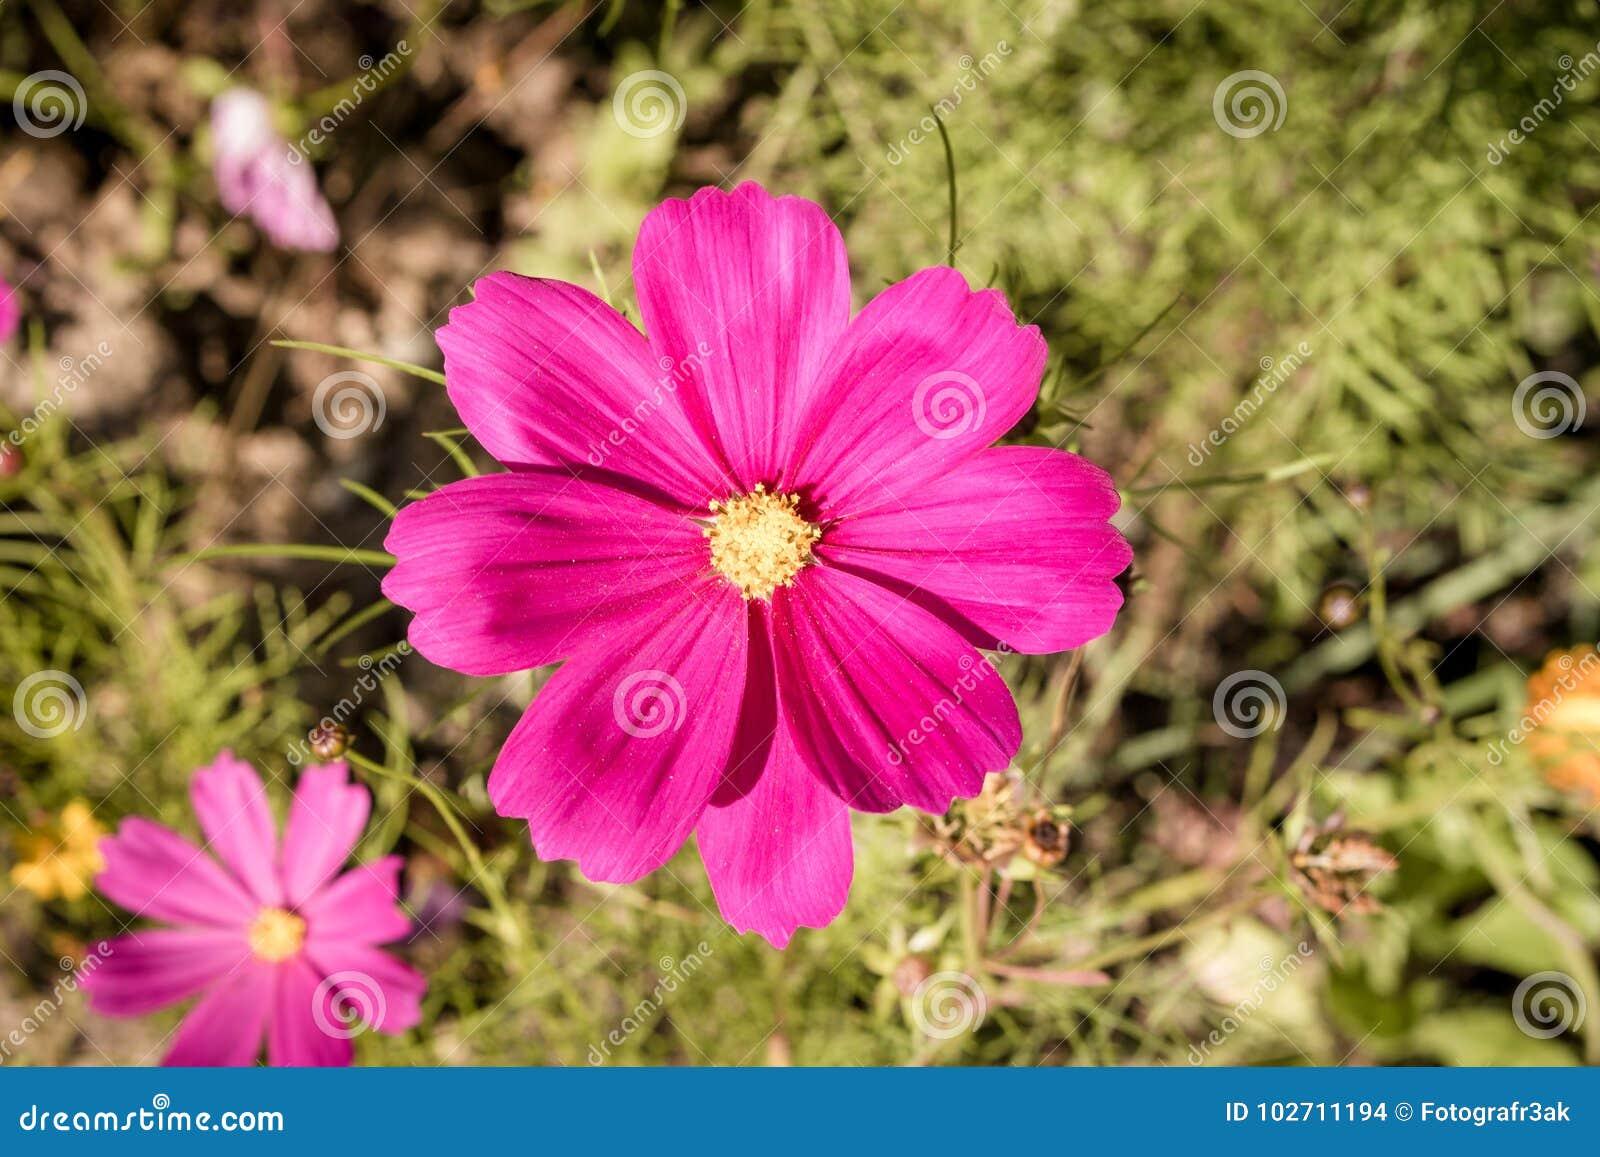 Arranjo De Flores 4 De Cosmea Foto De Stock Imagem De Esfrege